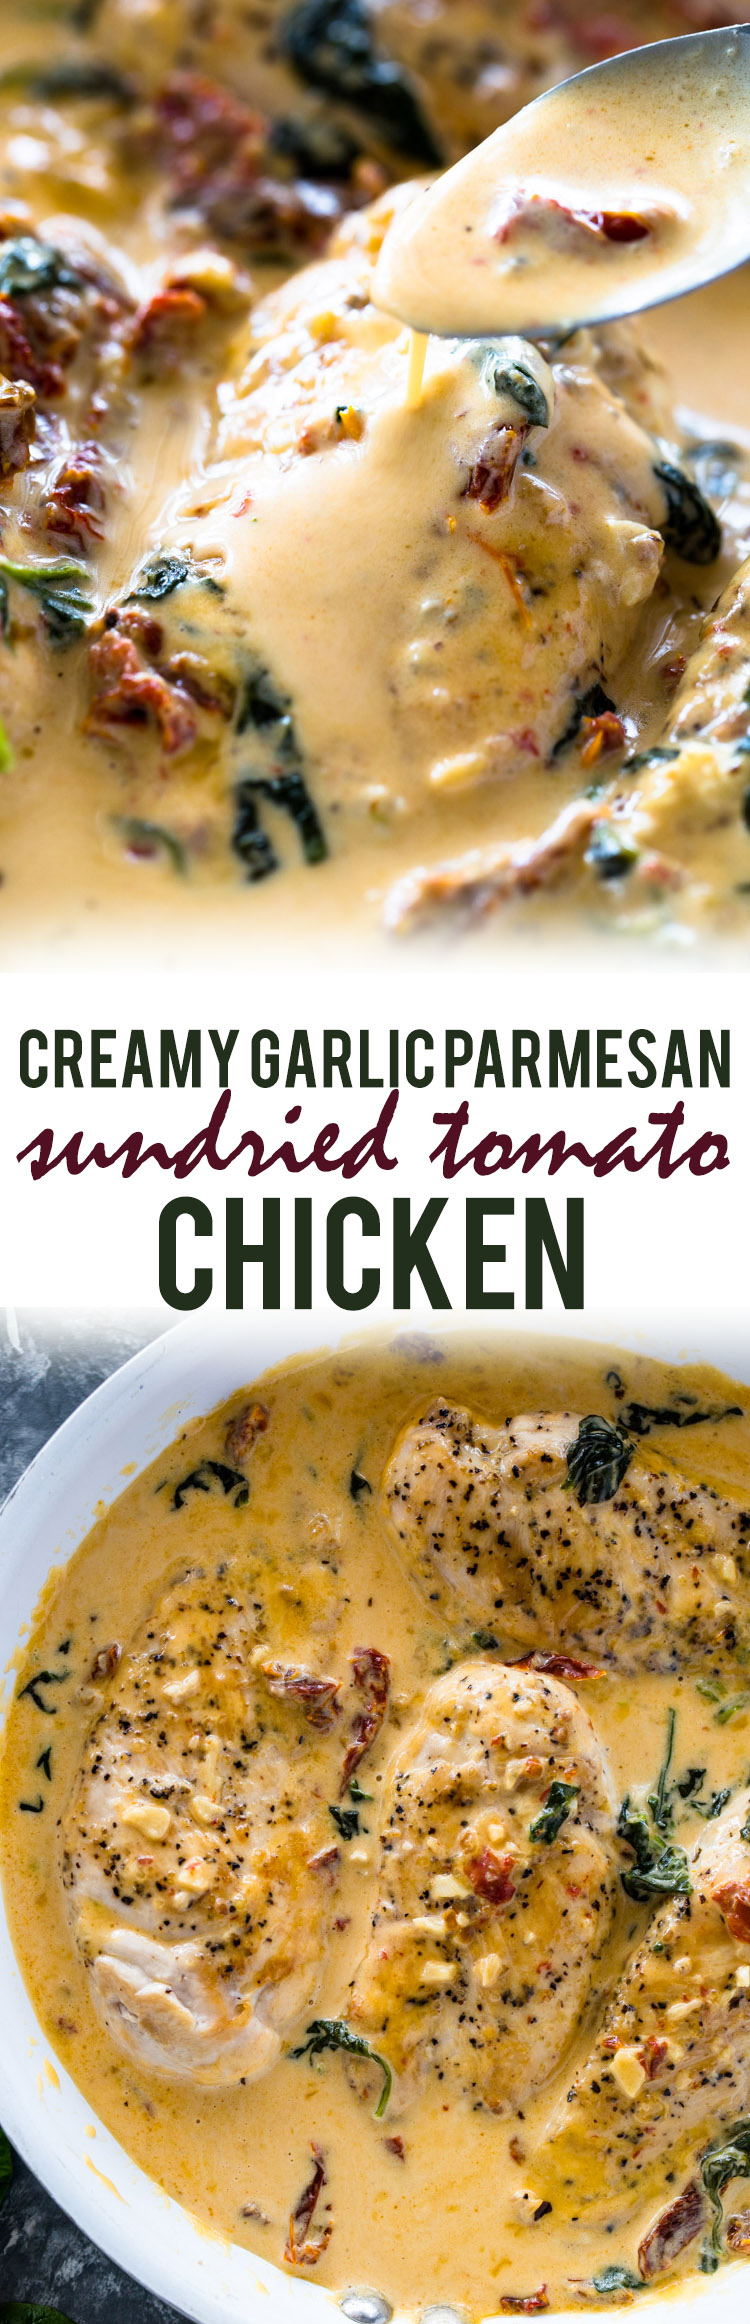 Creamy Garlic Parmesan Sun-dried Tomato Chicken